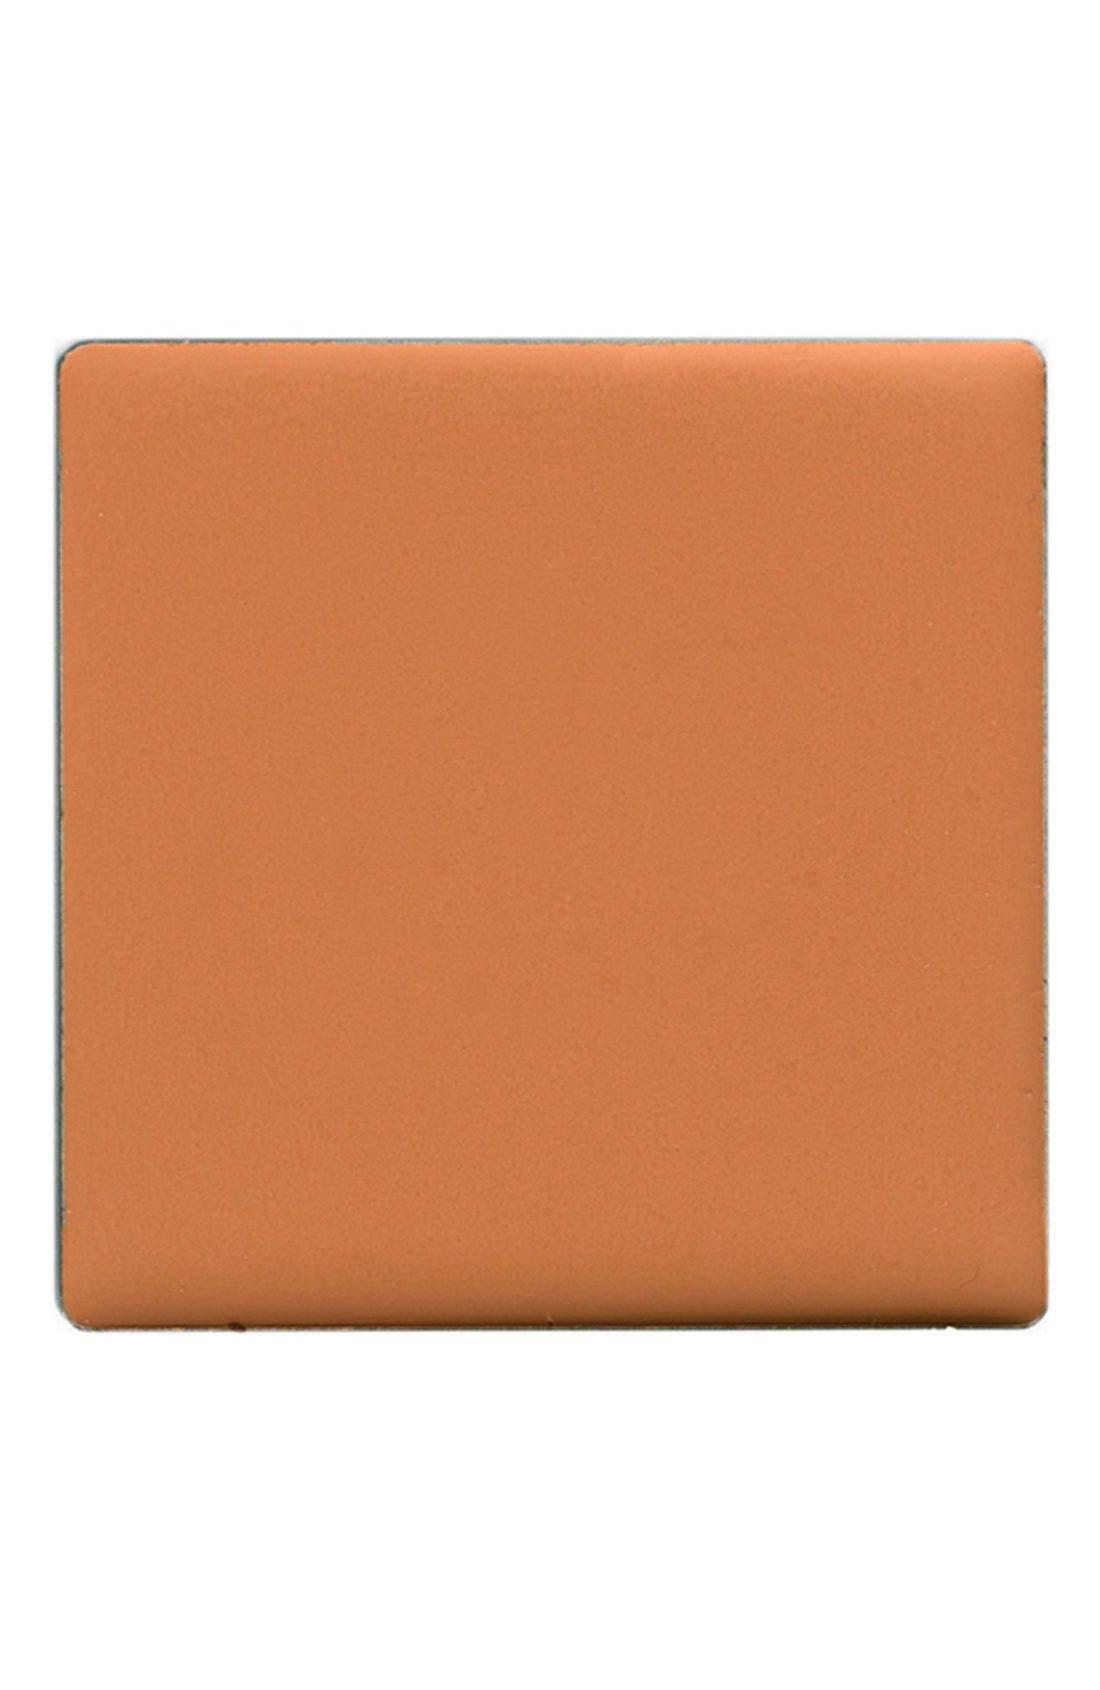 Even Skin Portable Foundation Refill,                             Alternate thumbnail 2, color,                             001